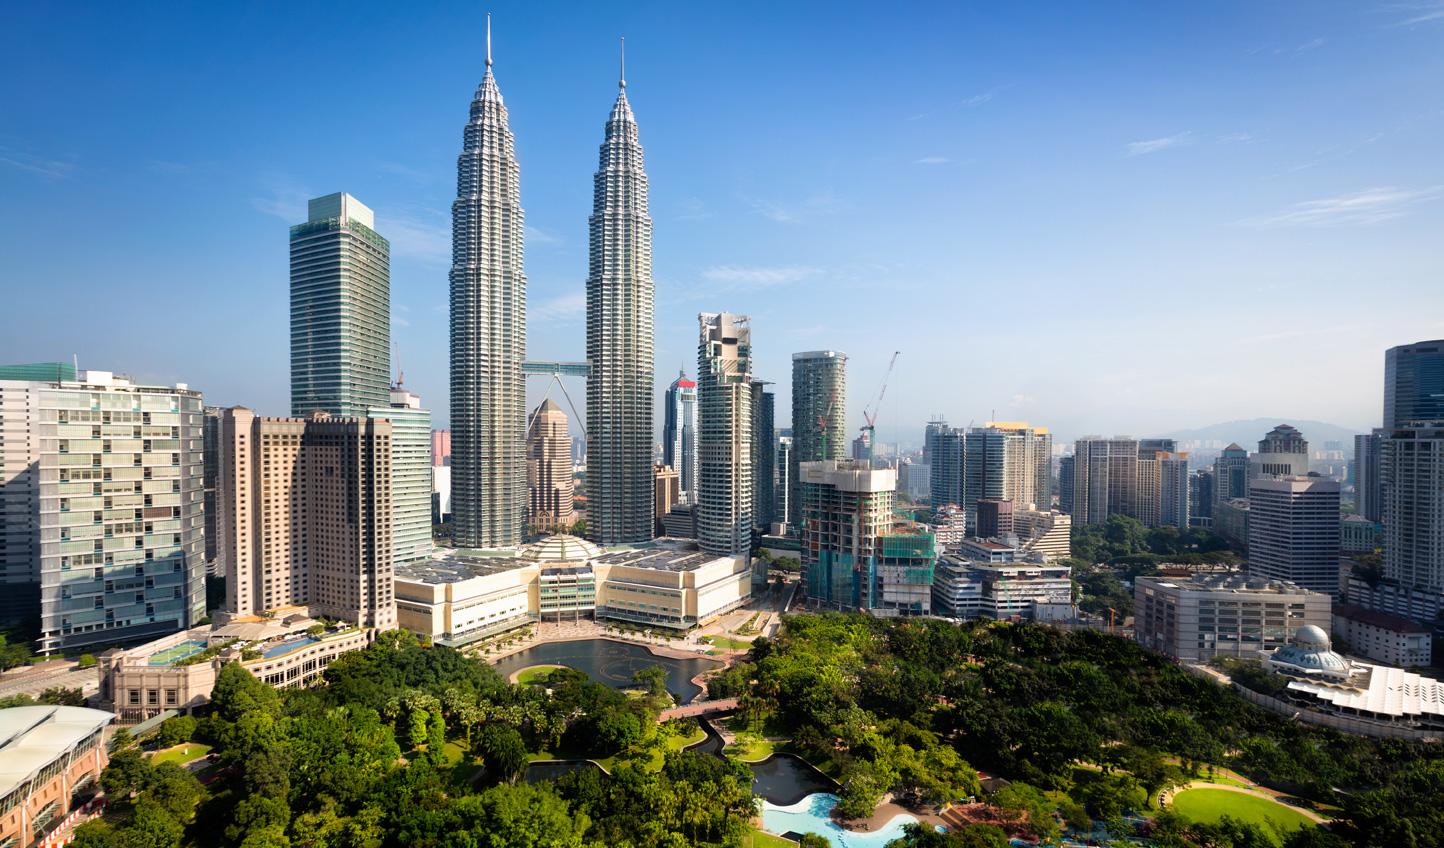 Kickstart your trip amid the buzz of Kuala Lumpur